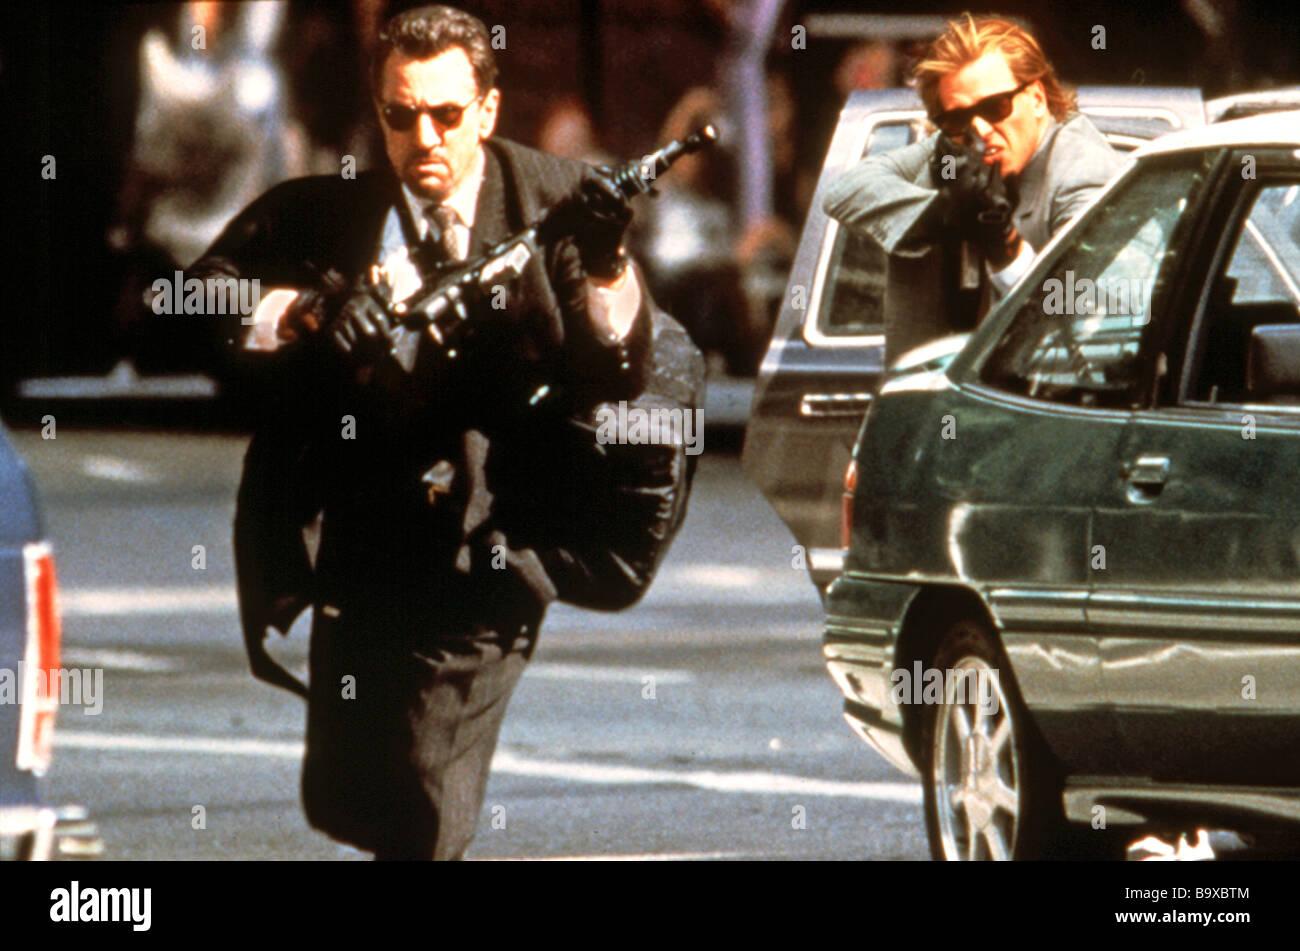 HEAT 1995 Warner film with Al Pacino at left - Stock Image